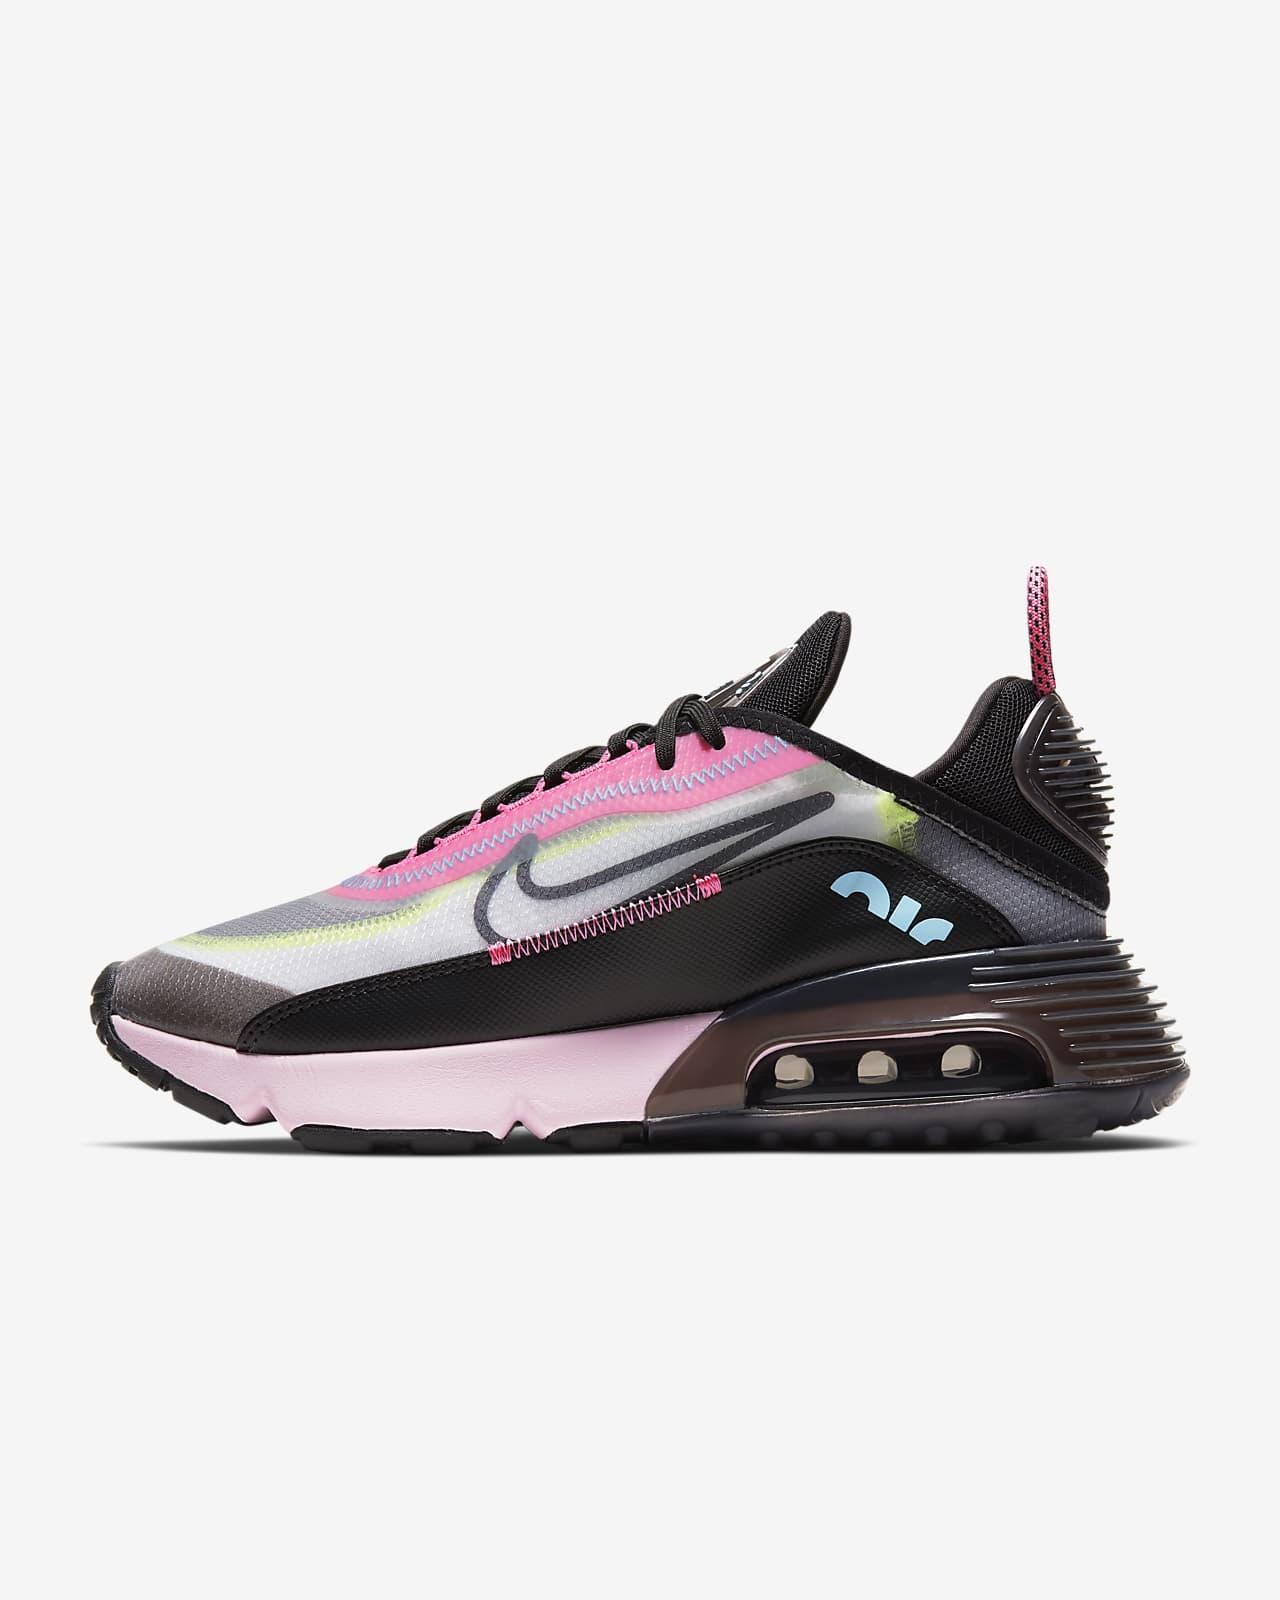 Dámská bota Nike Air Max 2090